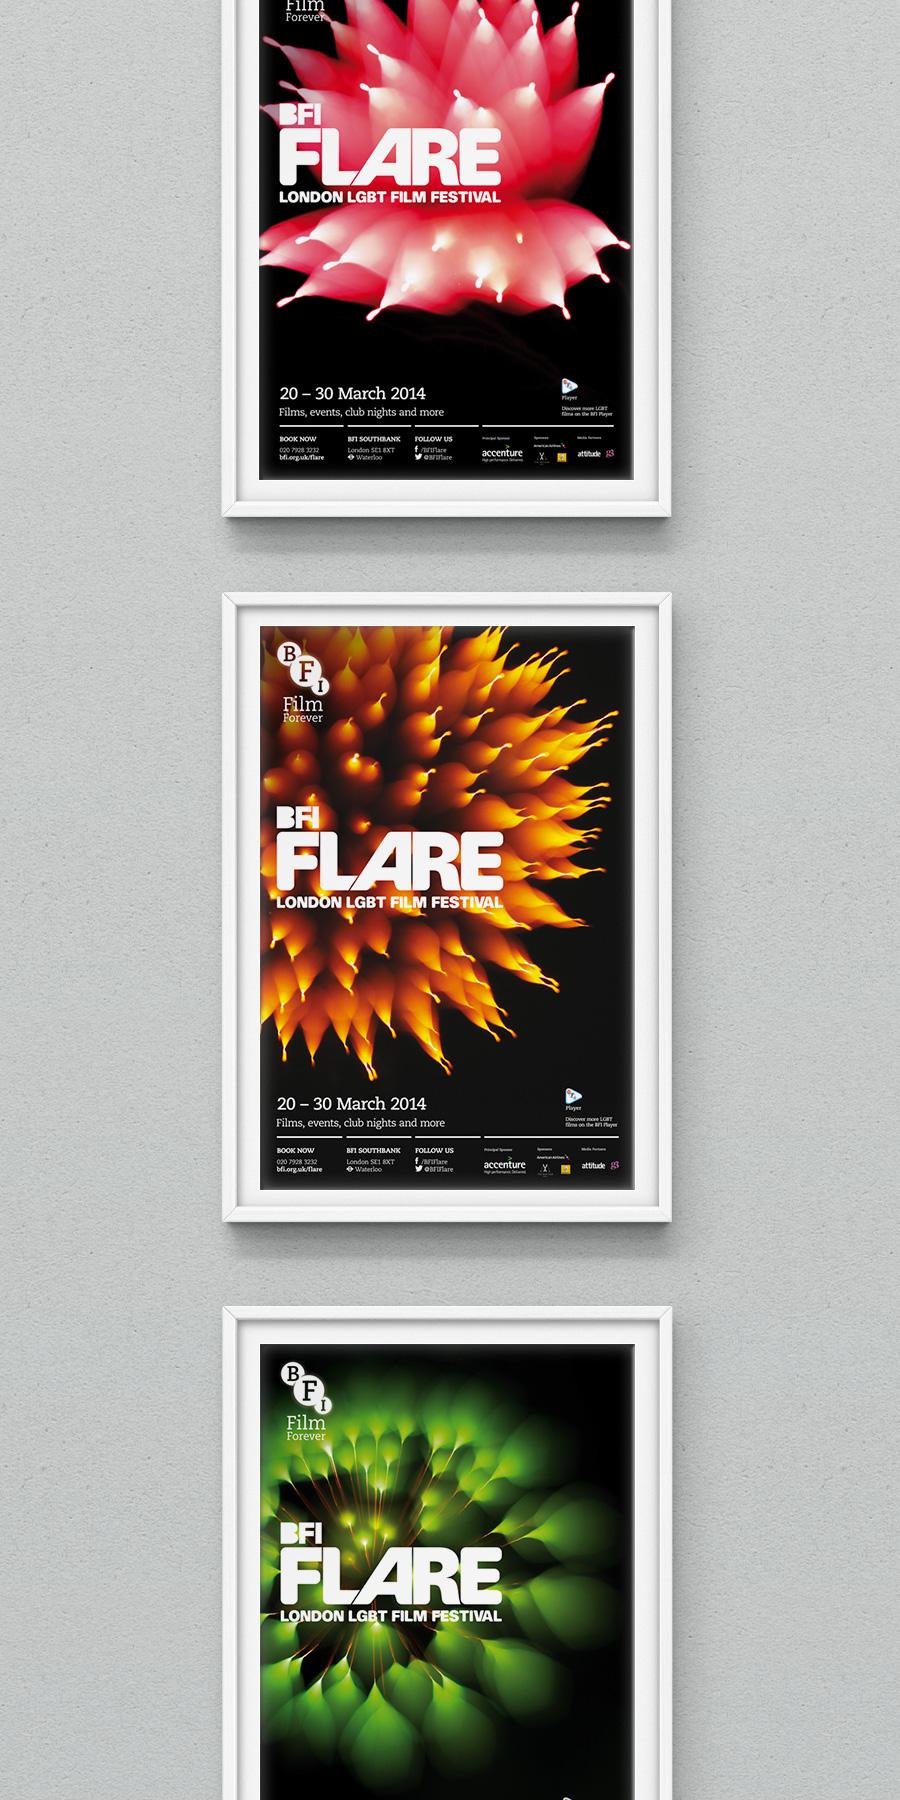 BFI Flare London LGBT Film Festival